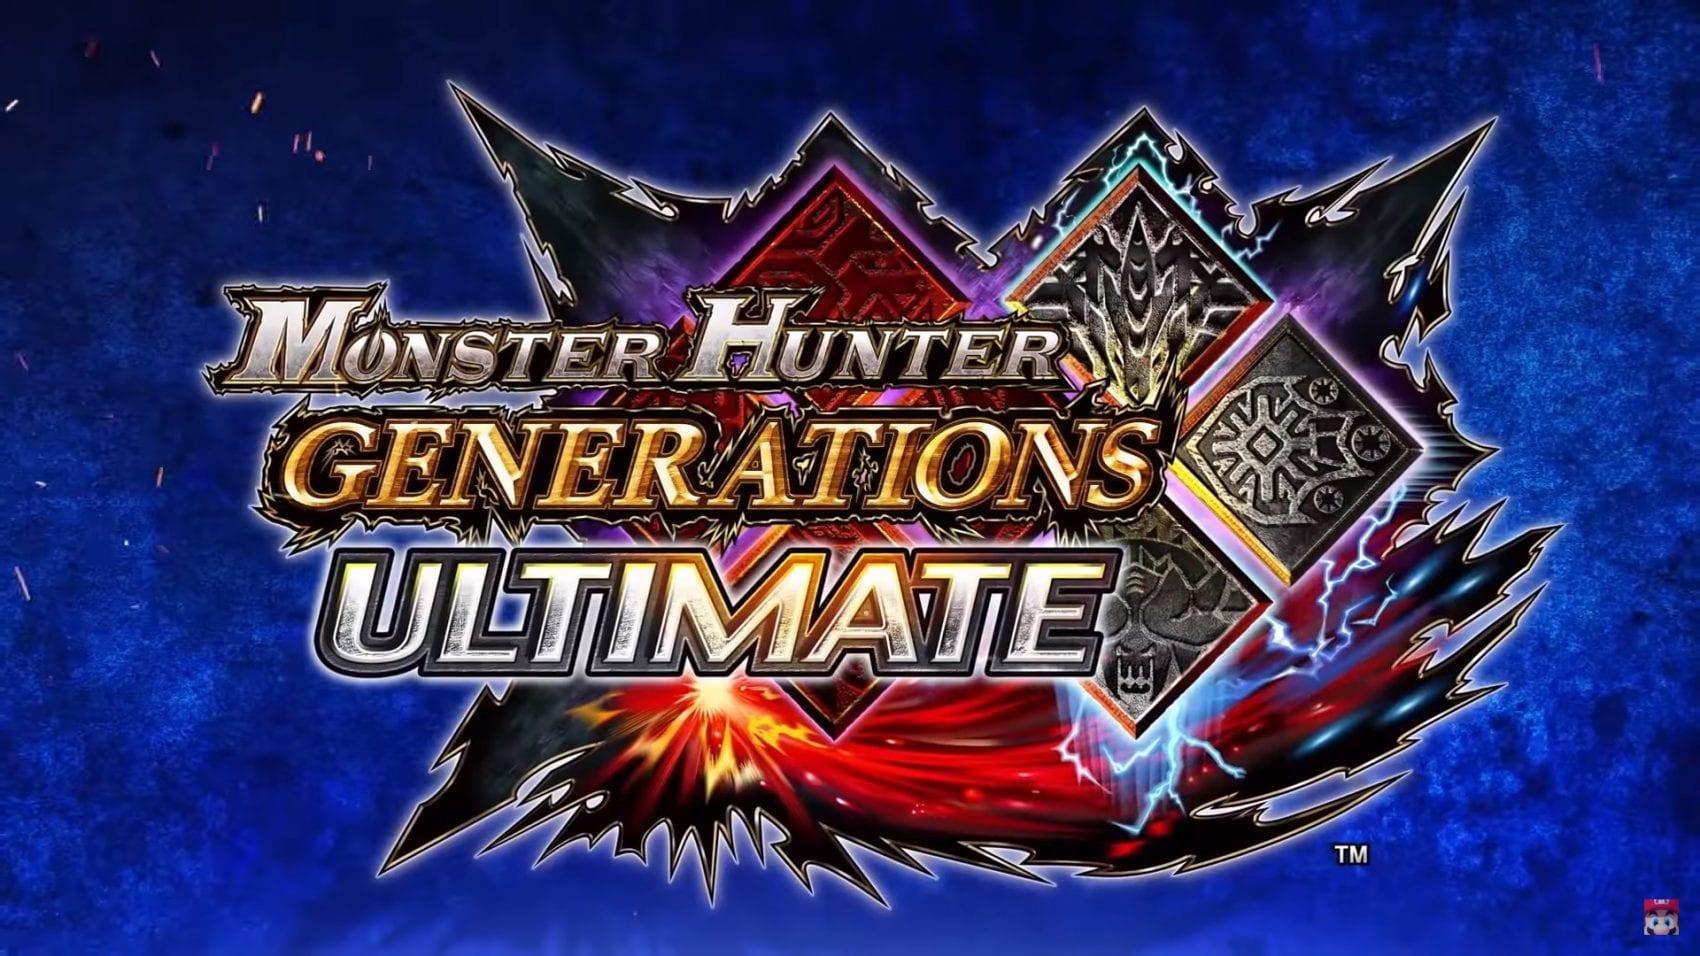 NEWS – Monster Hunter Generations Ultimate